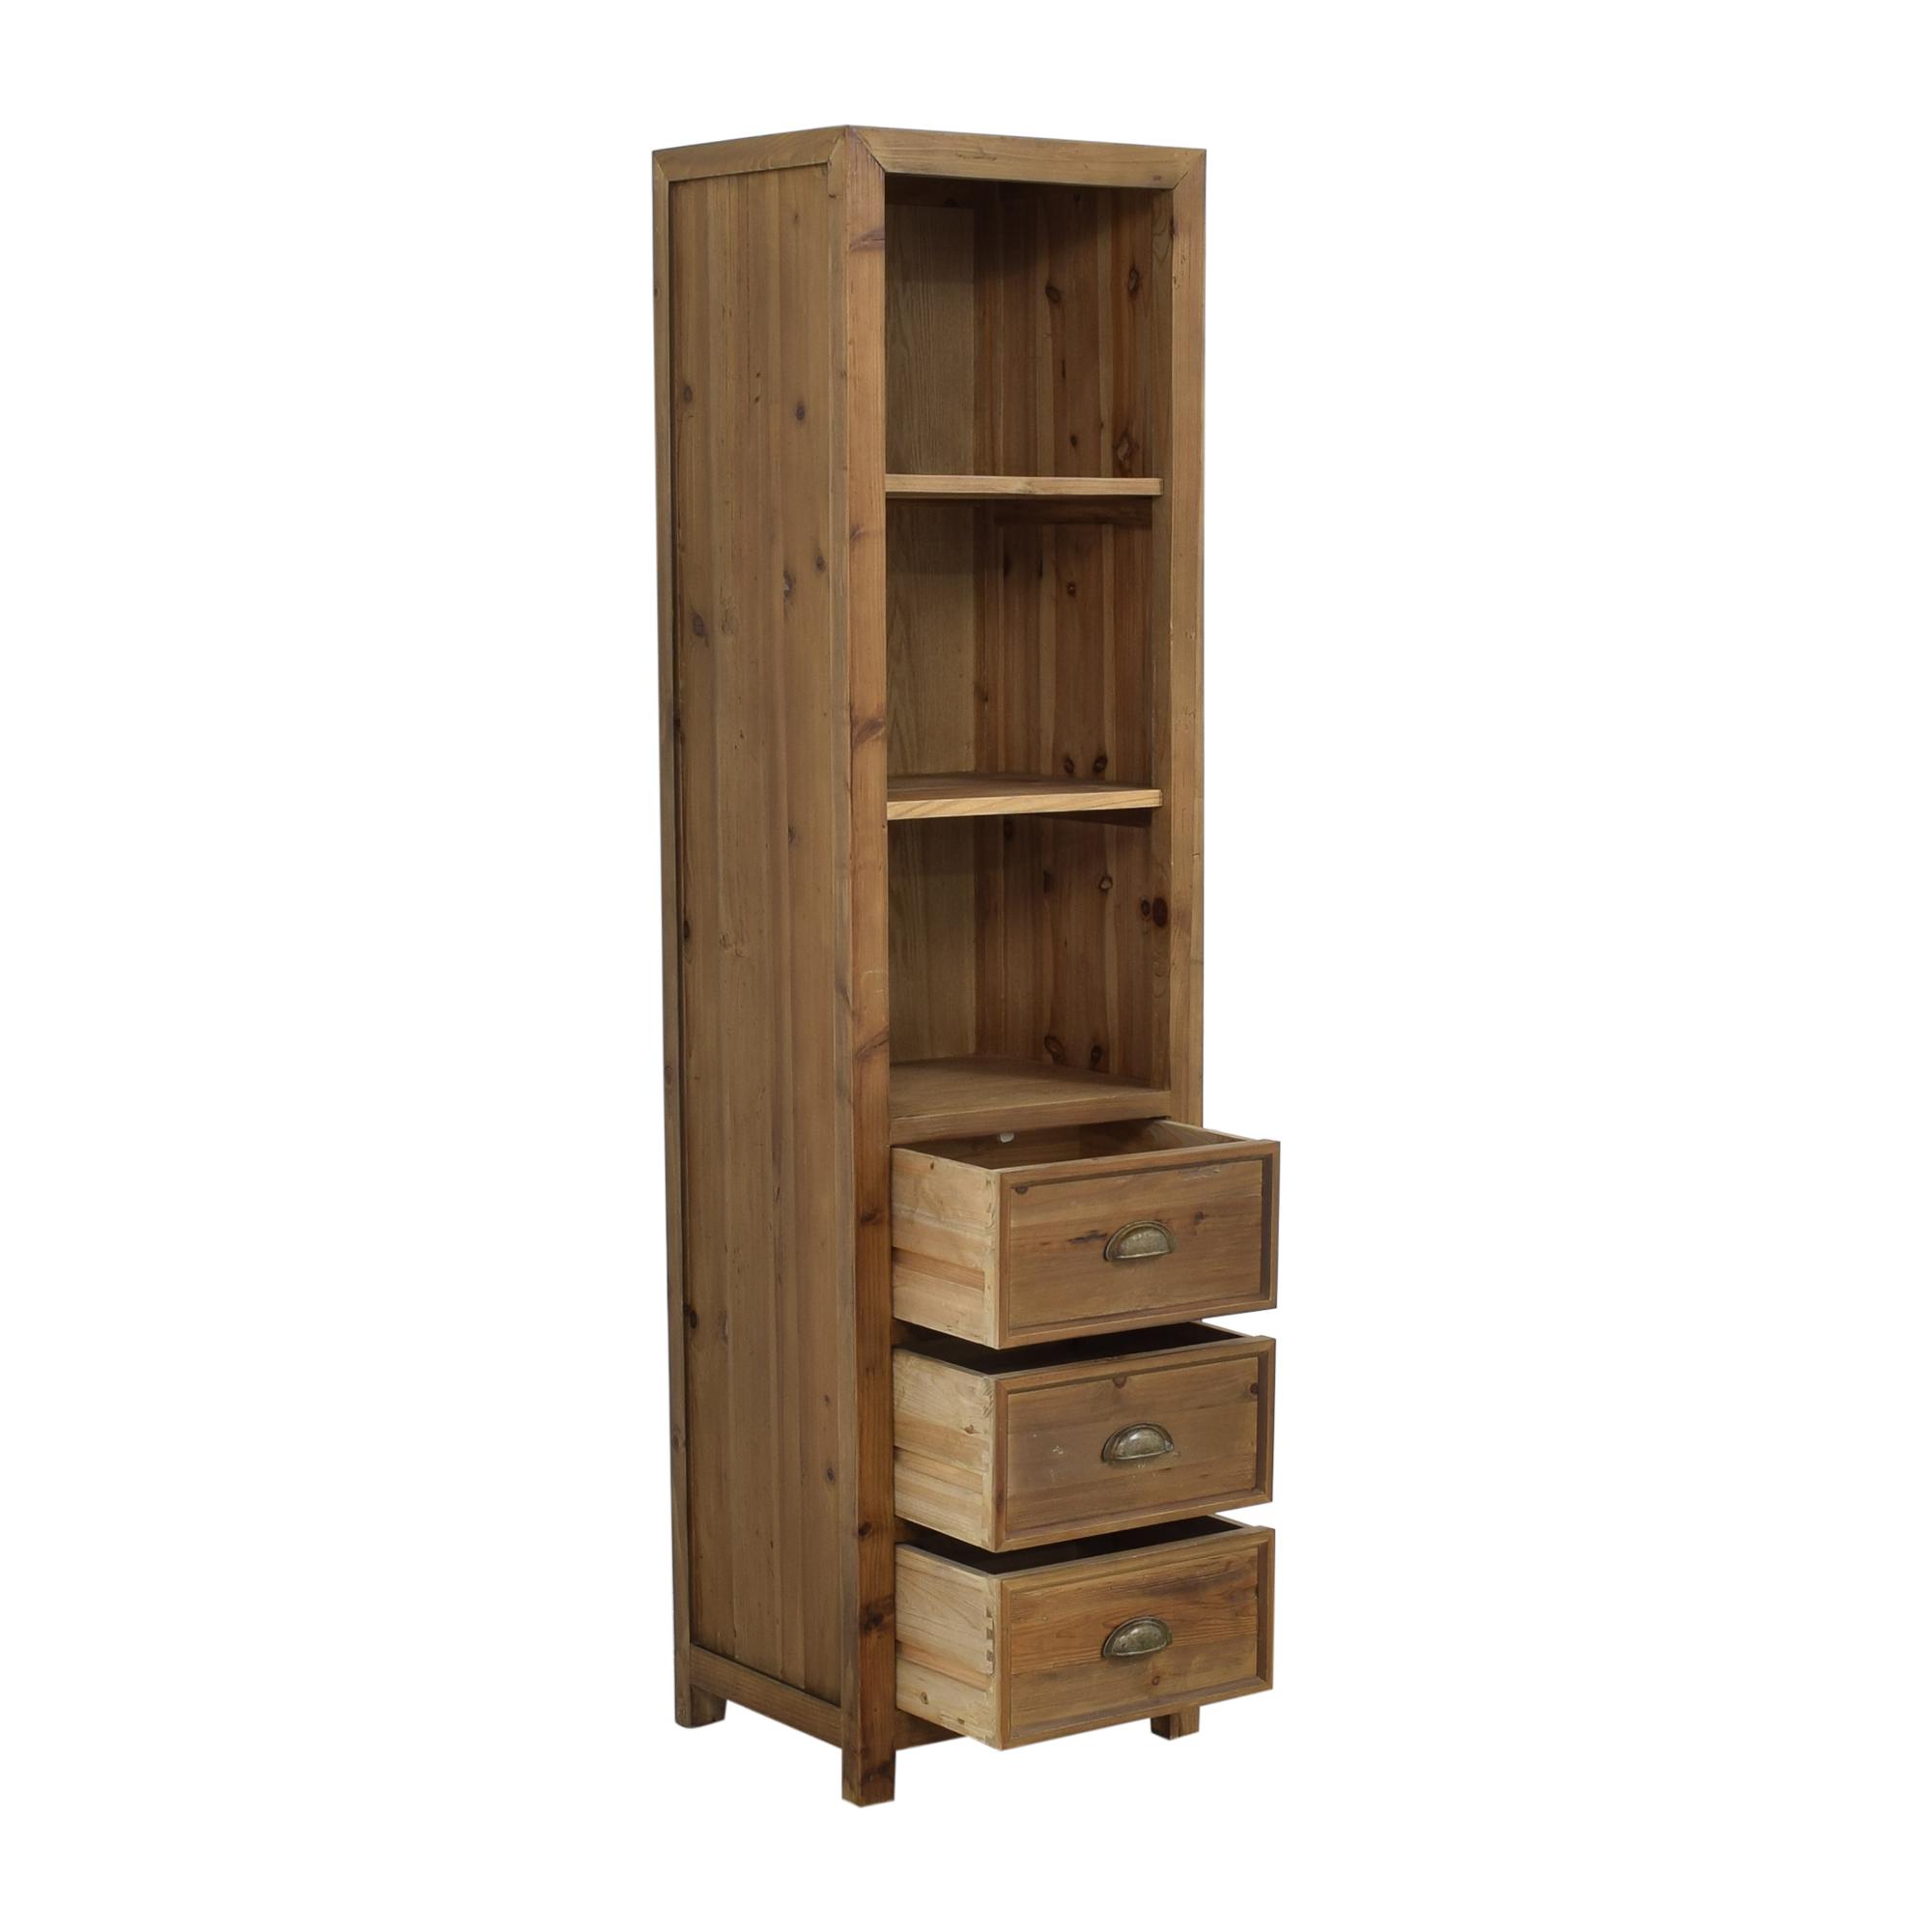 buy Stone & Beam Stone & Beam Bryson Tall Narrow 3-Drawer Bookcase online